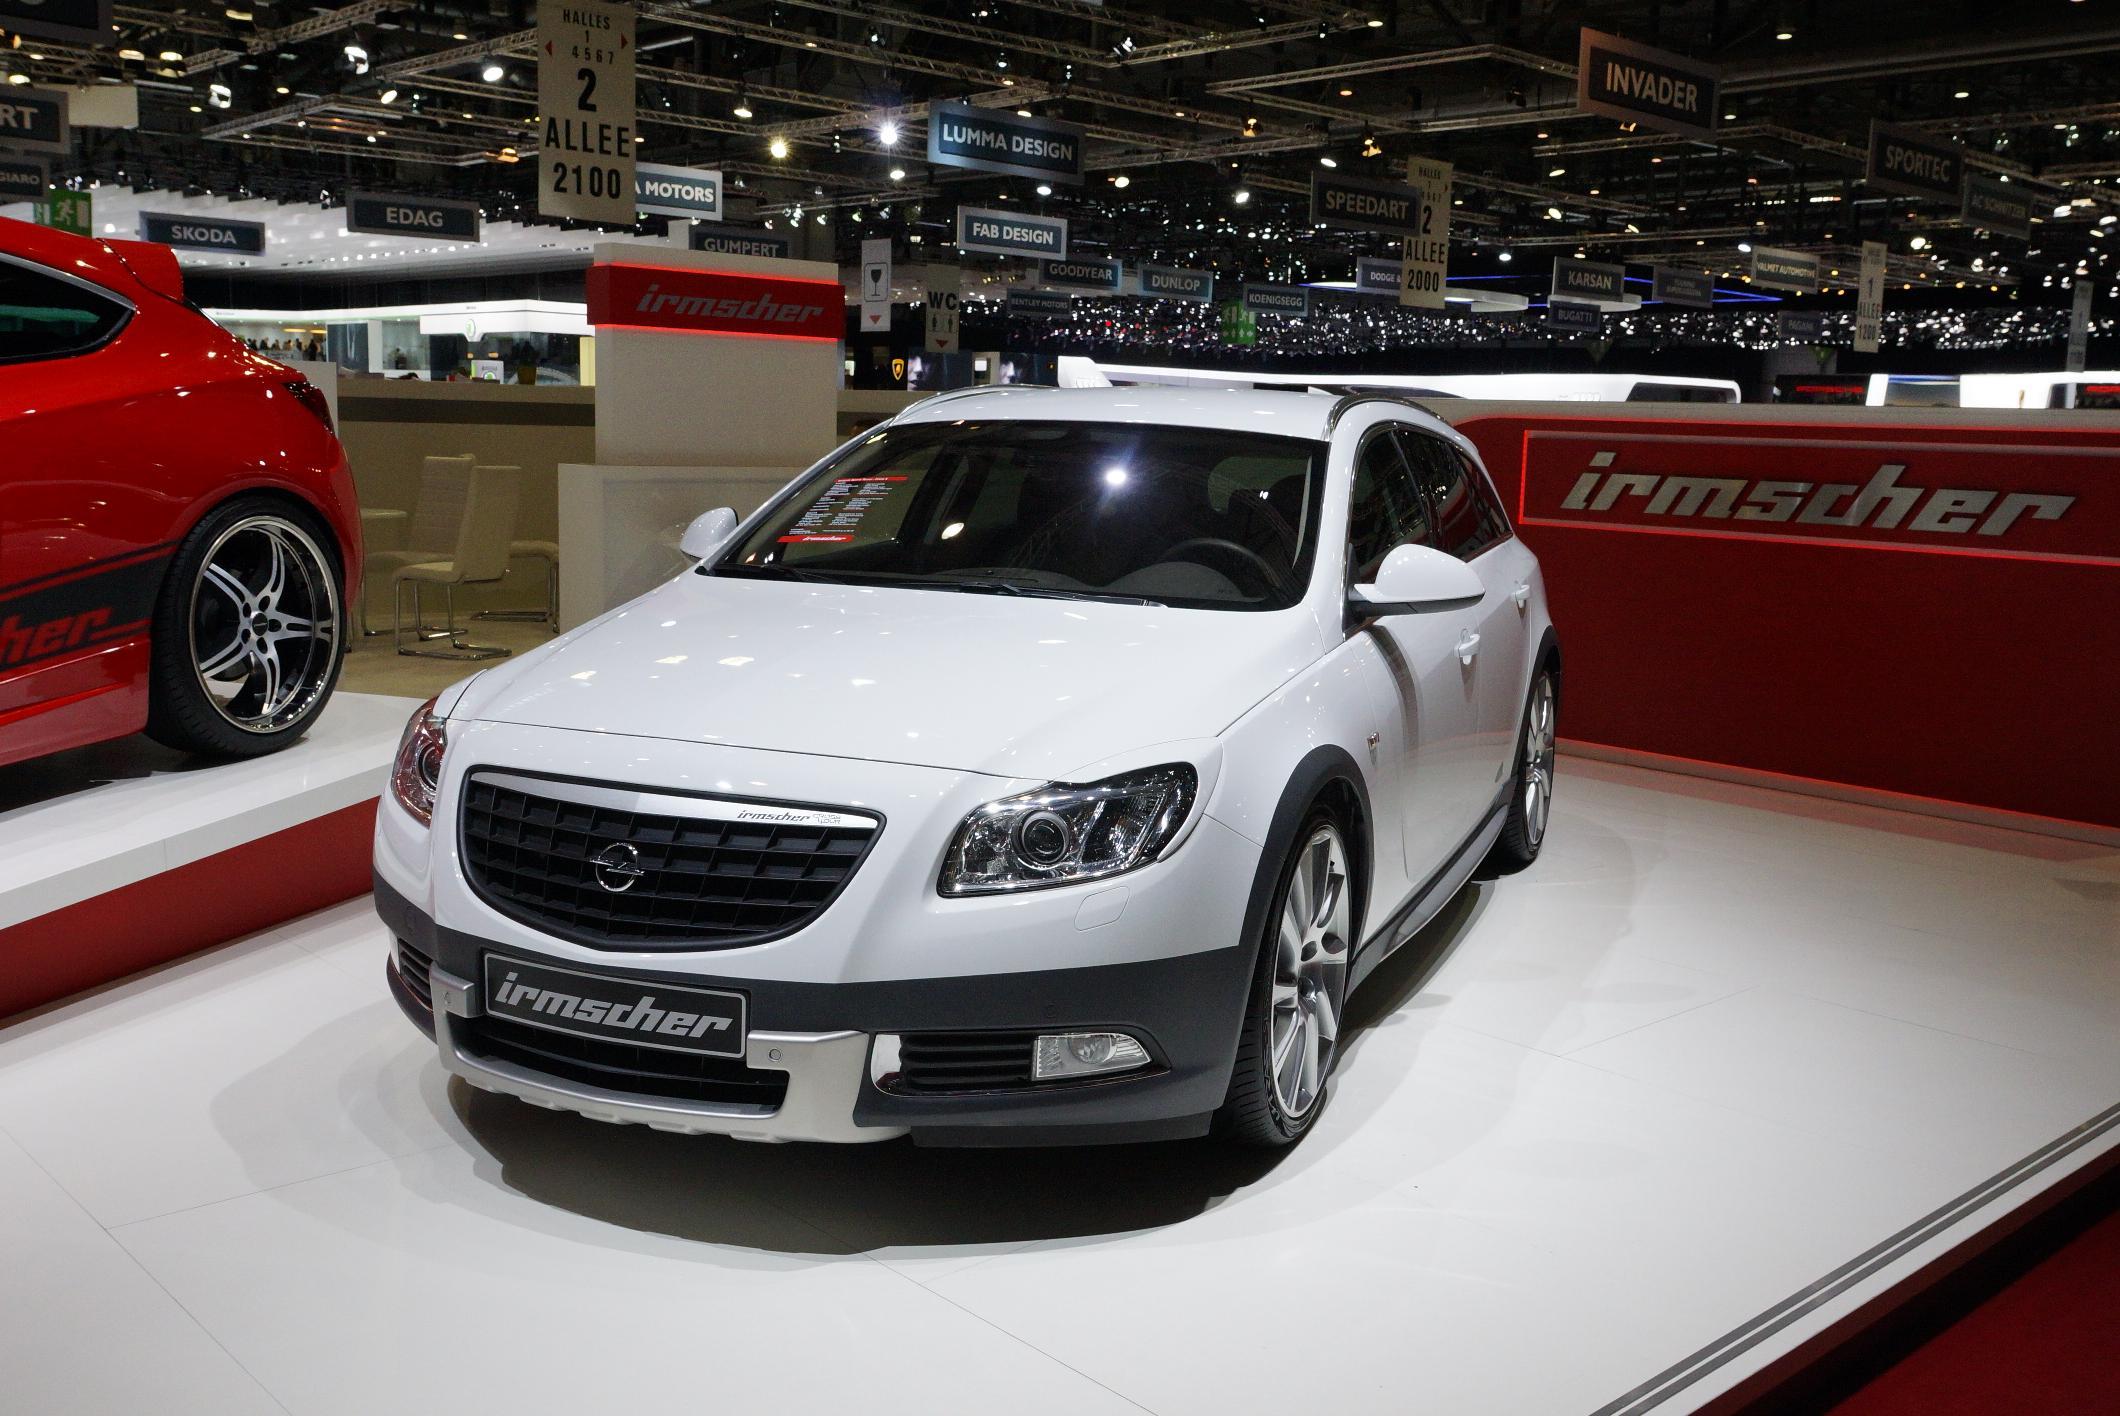 Irmscher Opel Insignia Tourer Geneva 2012